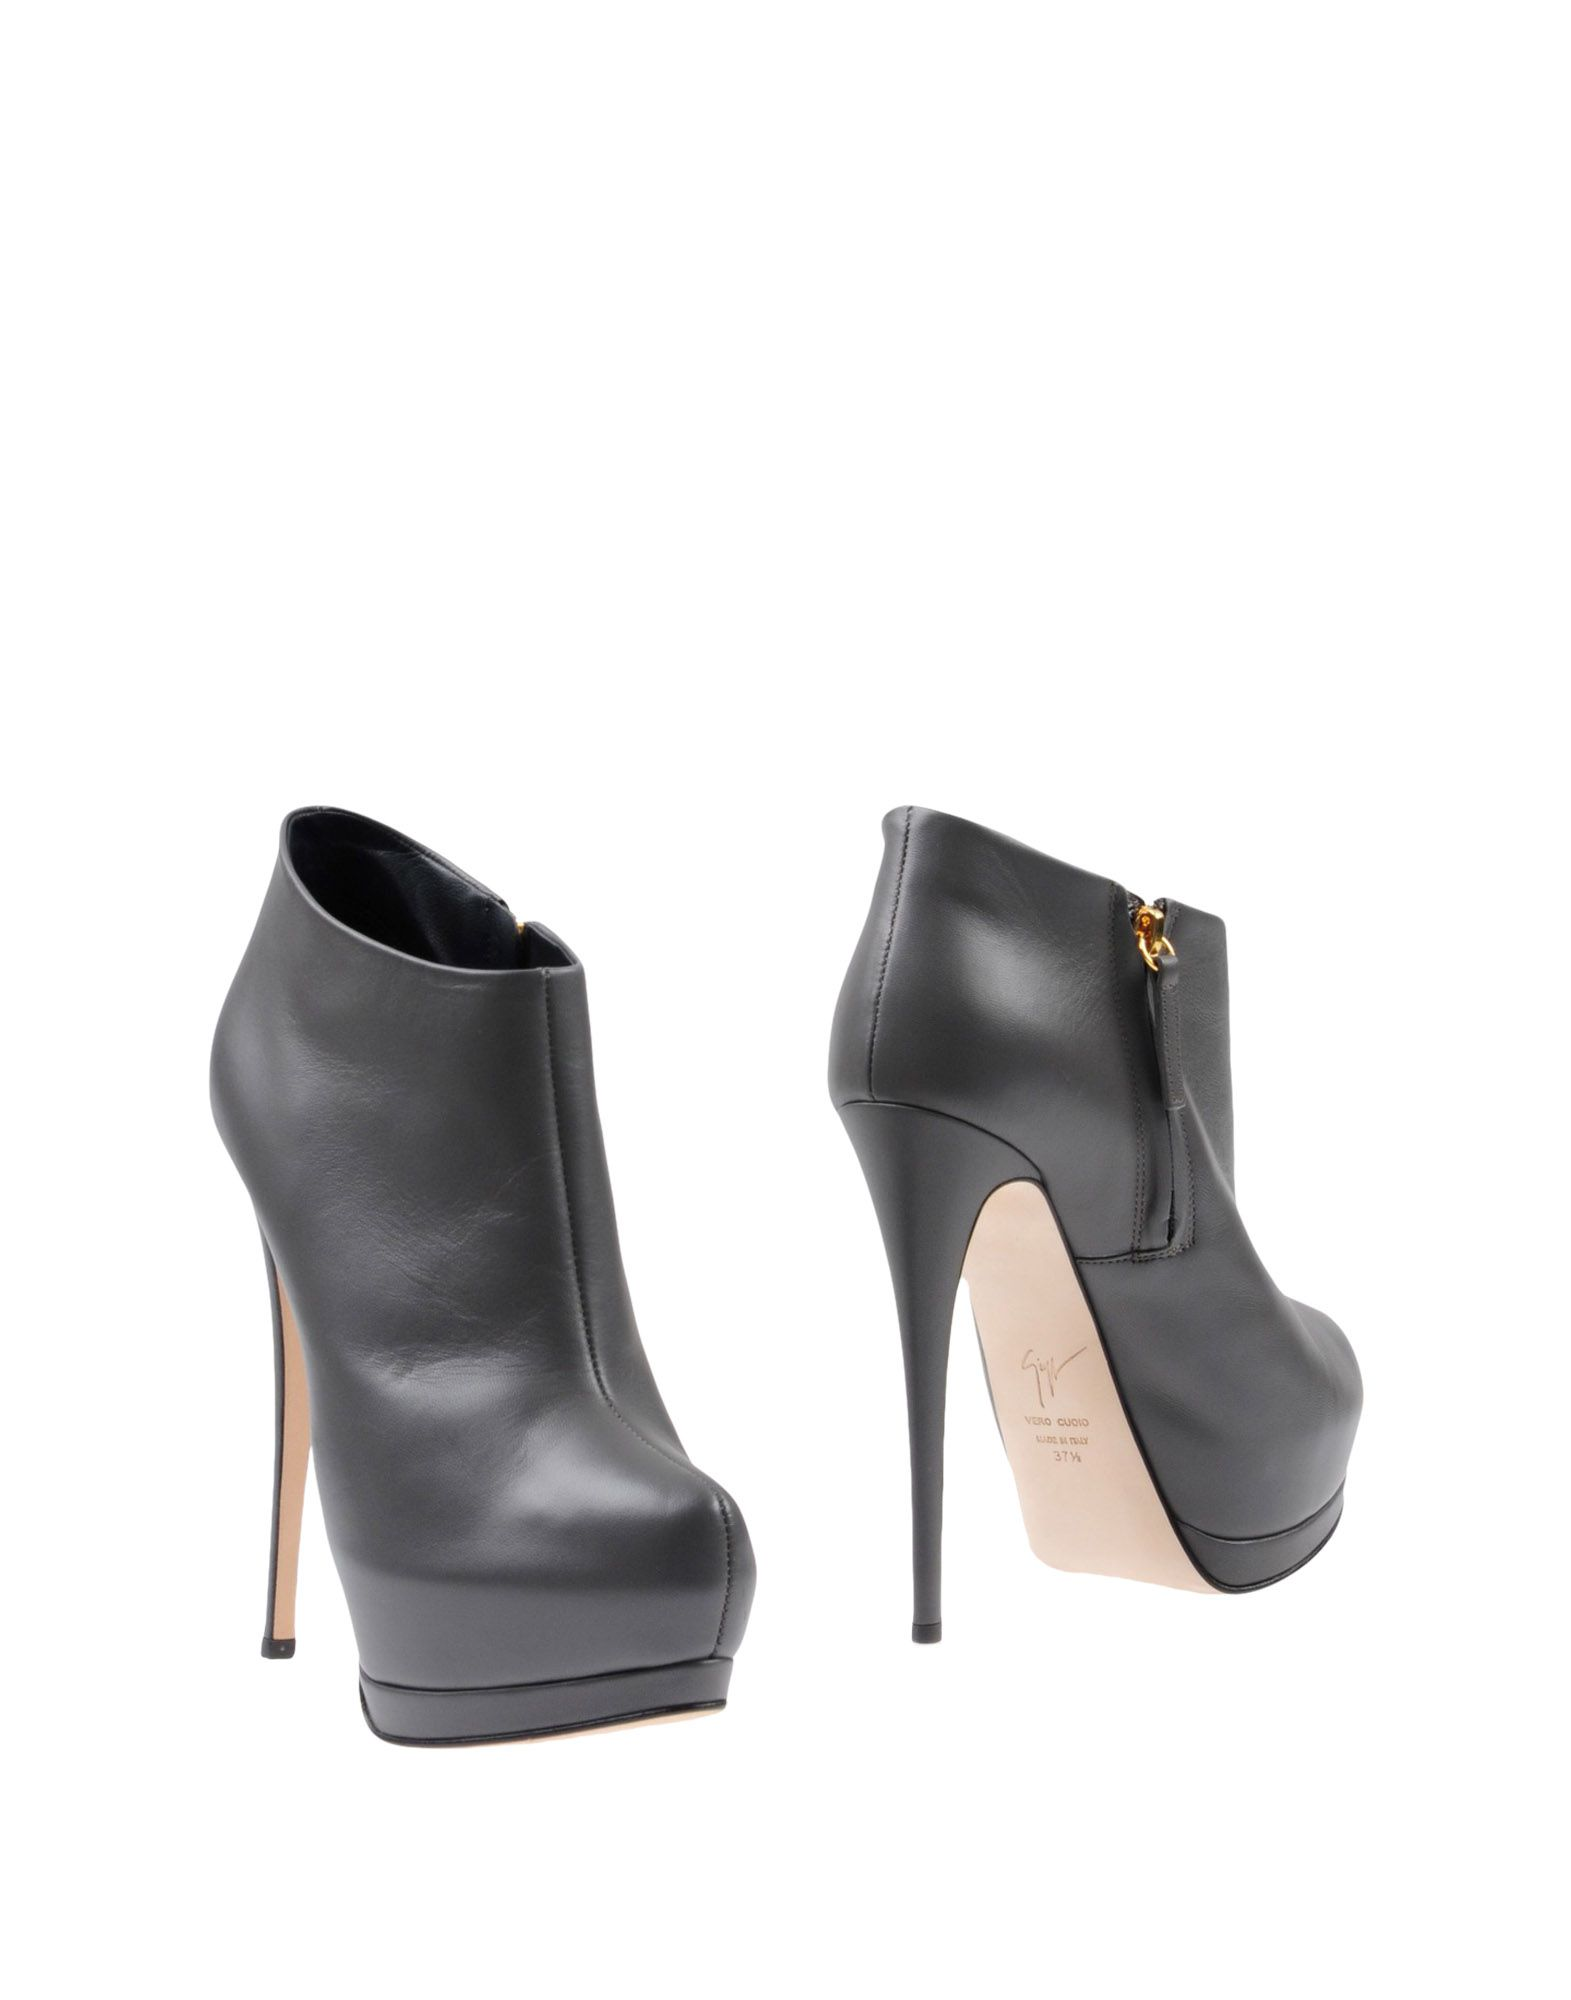 Giuseppe Zanotti Stiefelette Damen  11433498PJGünstige gut aussehende Schuhe